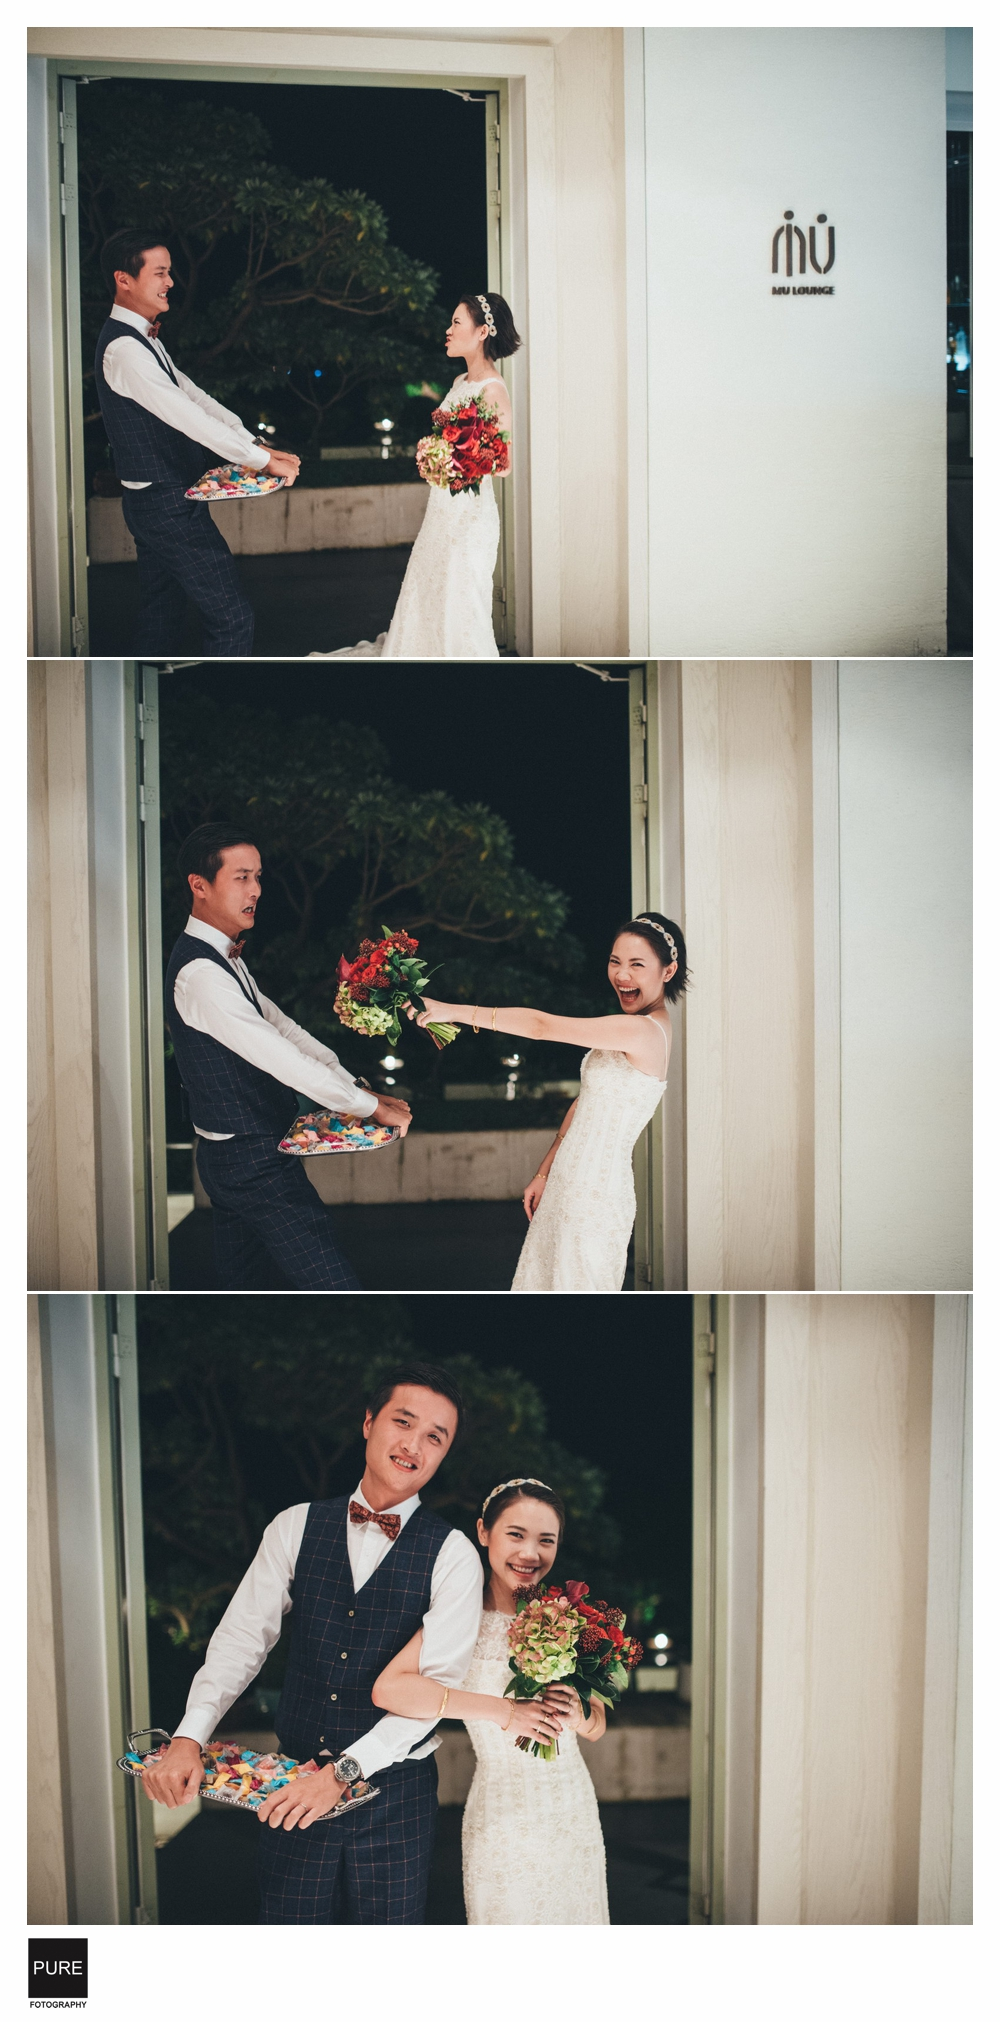 PUREFOTO_台灣婚禮平面攝影wedding_PUREFOTO台北美式婚禮攝影